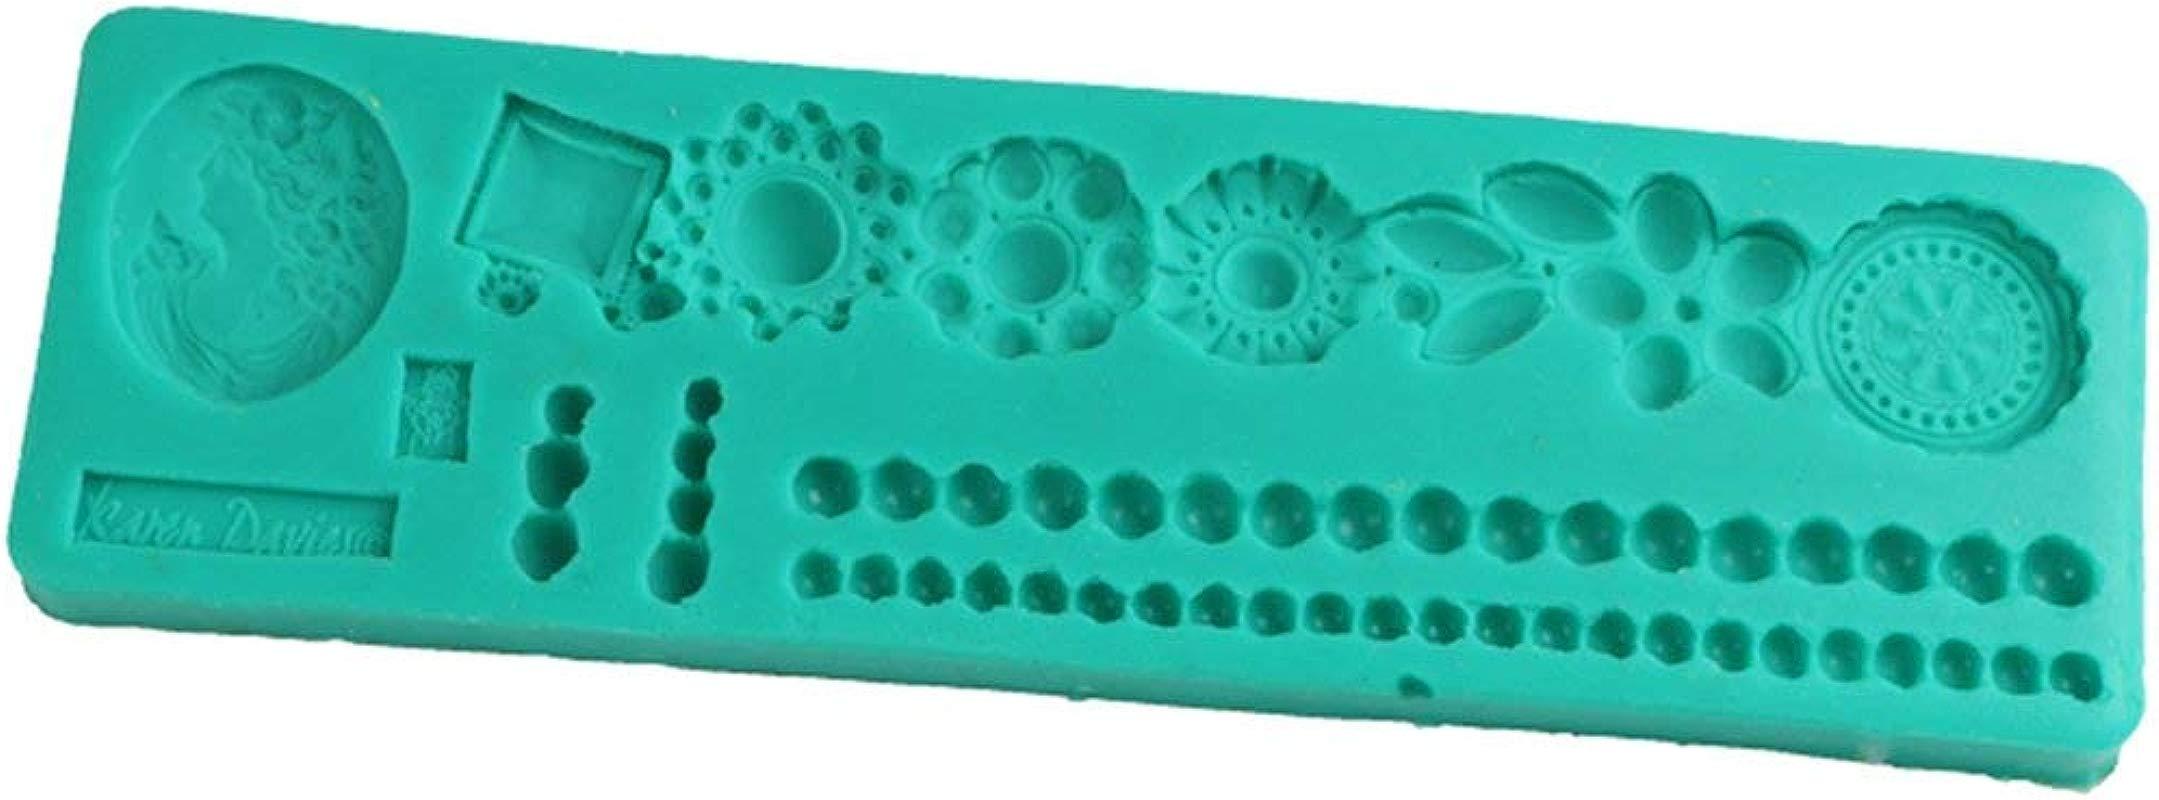 Colorsworld Necklace Chain Cake Fondant Baking Tool Silicone Cake Mould Cake Fondant Mold